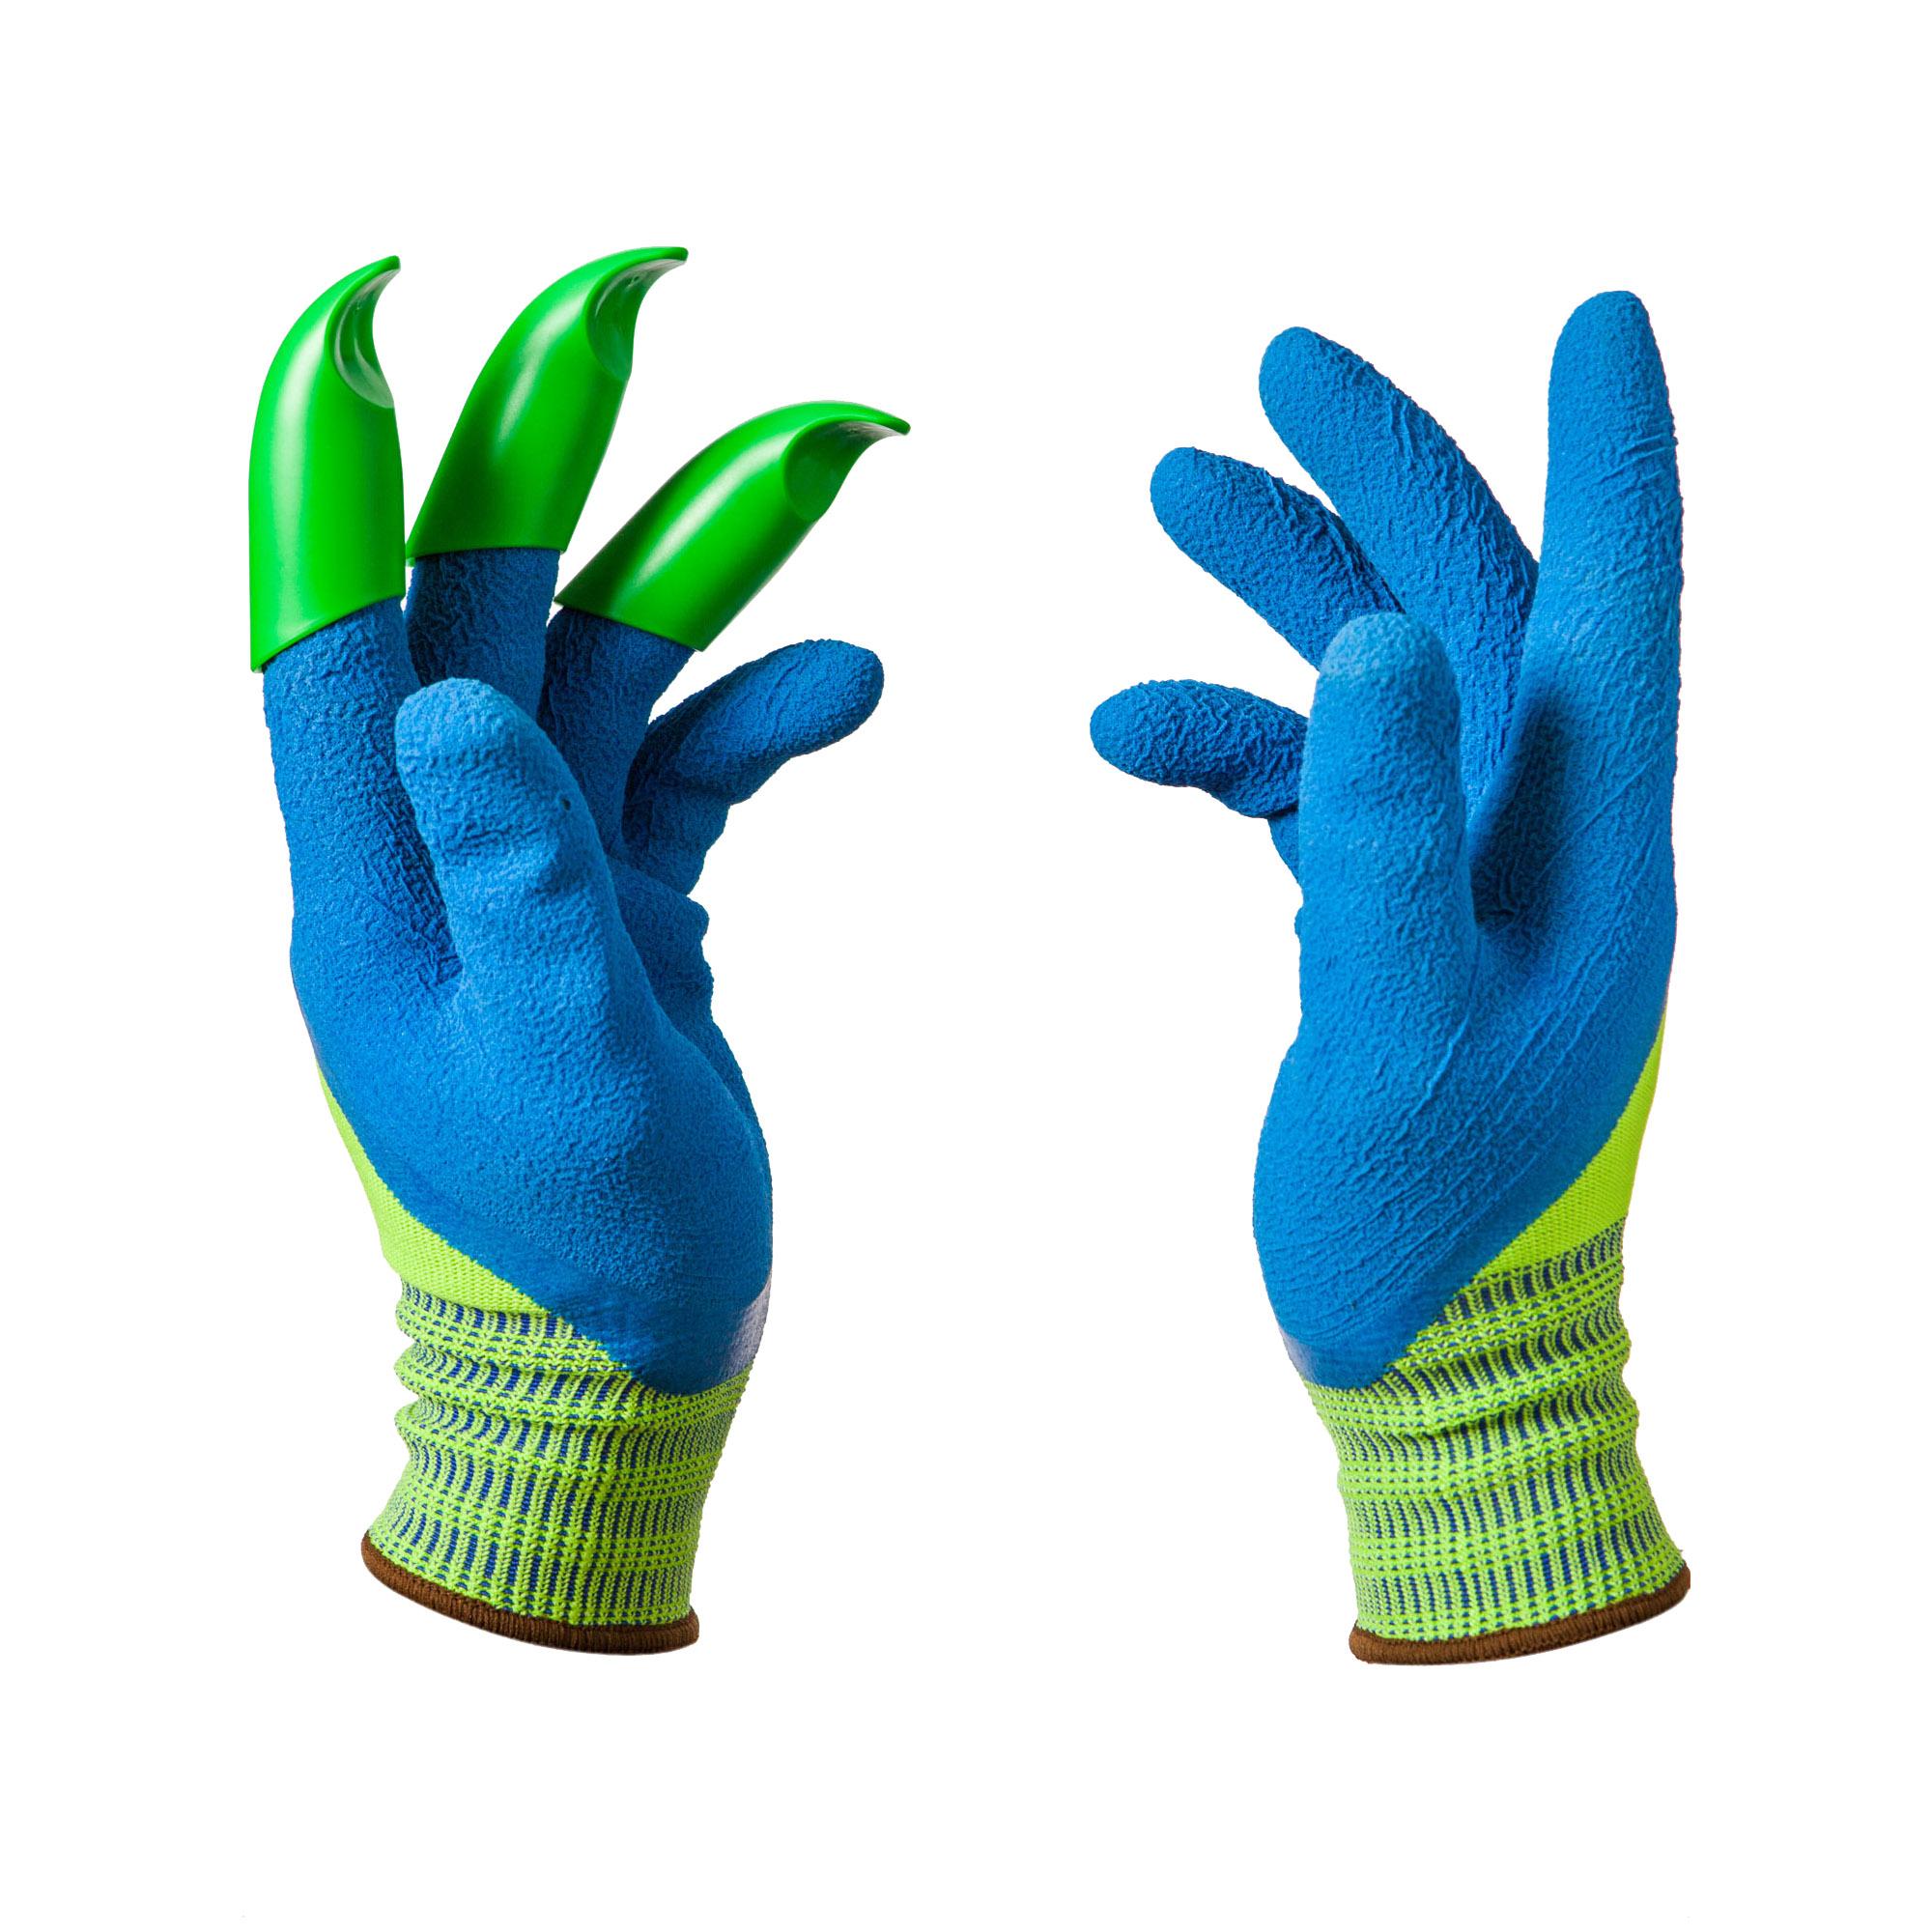 Green Claws Honey Badger Gloves